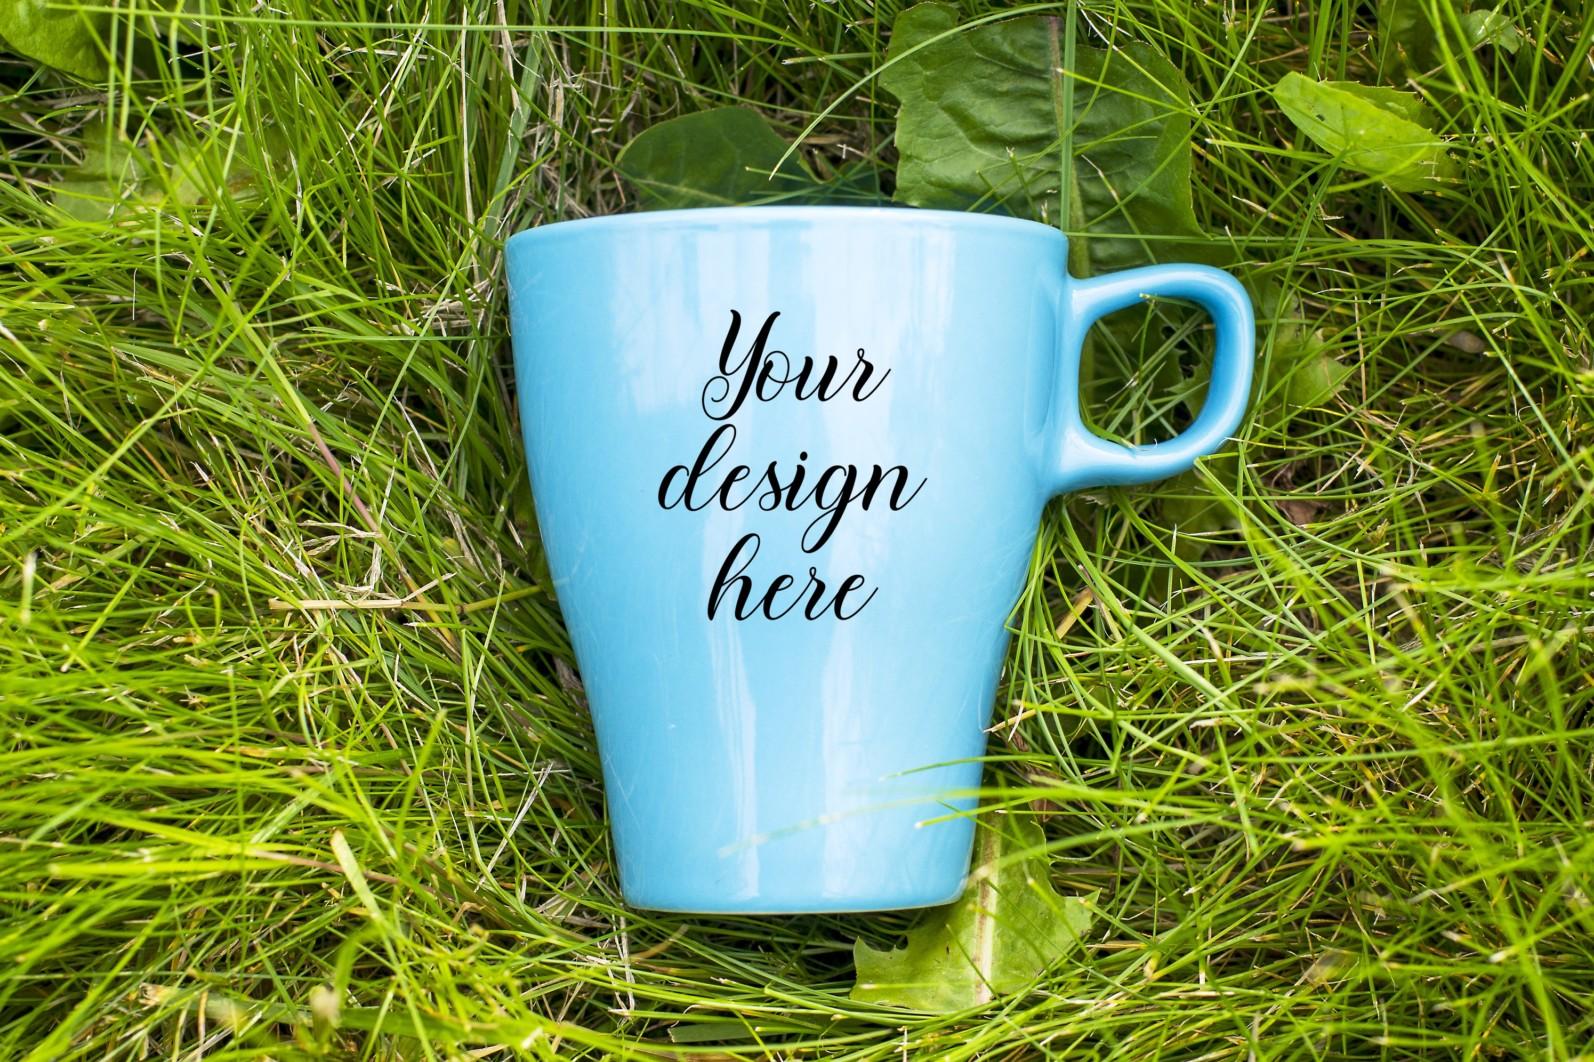 Coffee mug mockup bundle. Mug template bundle. PSD, JPEG files. - 2 1 1 scaled -